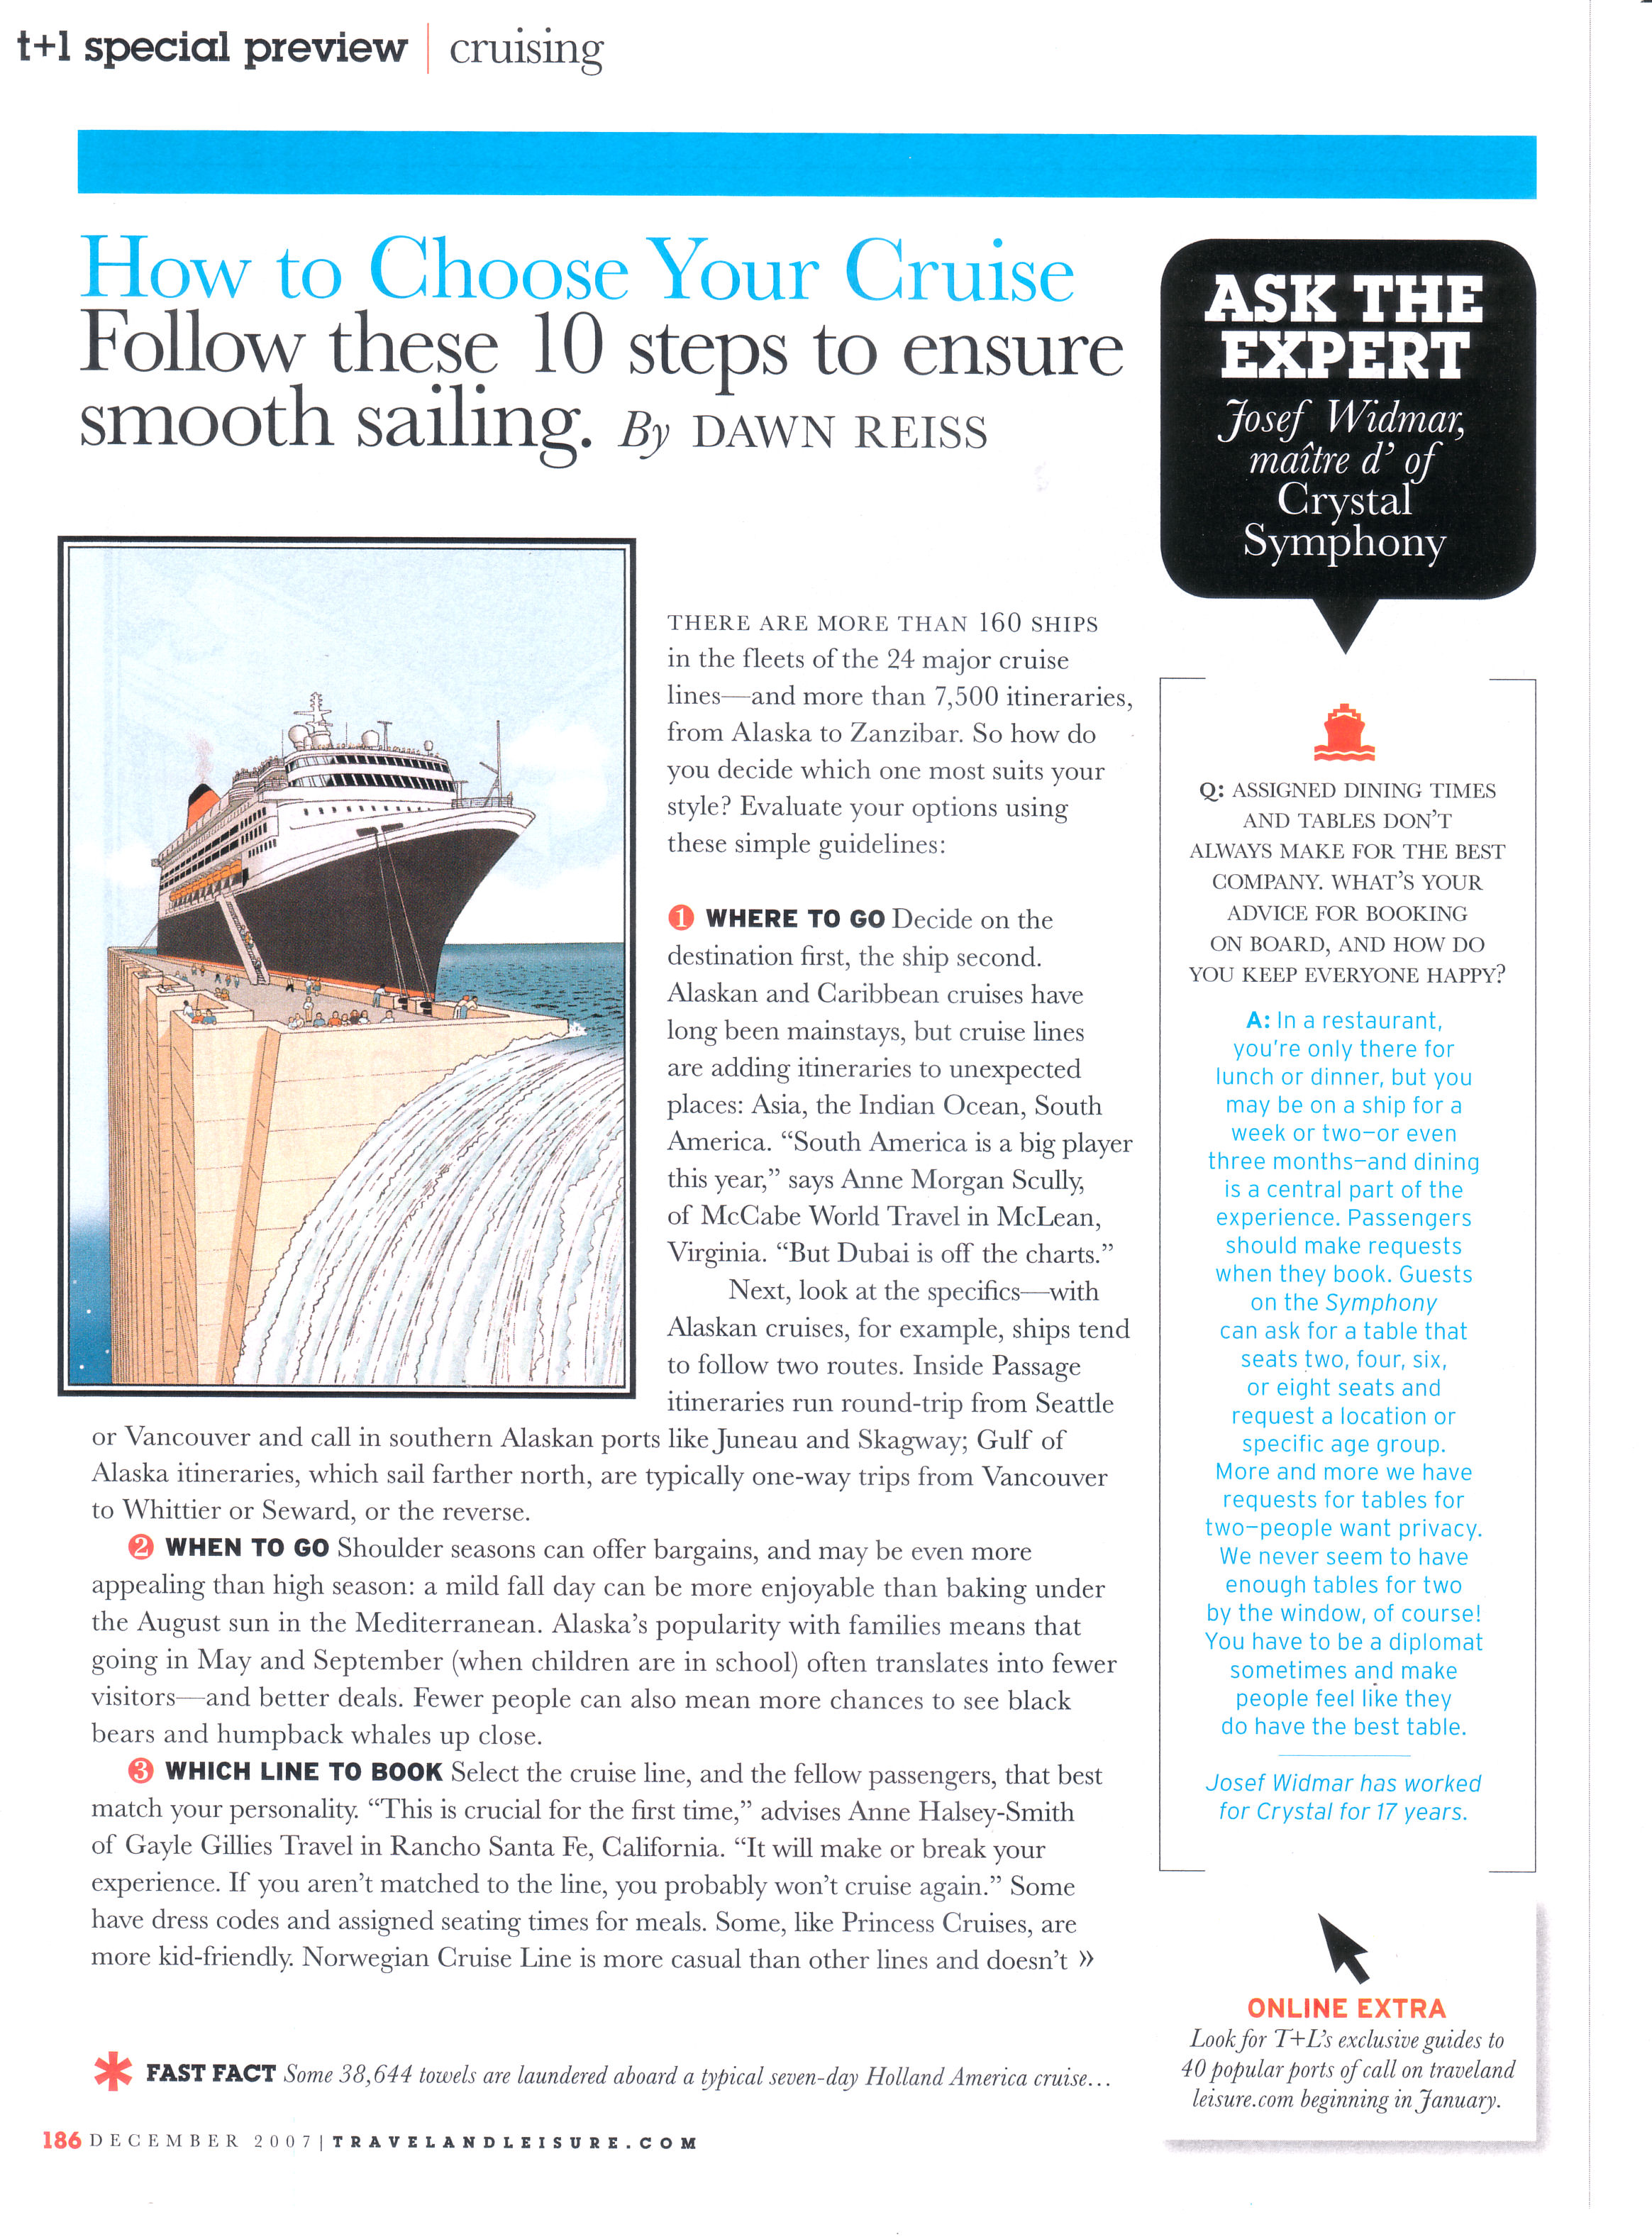 Tips for the cruise season.